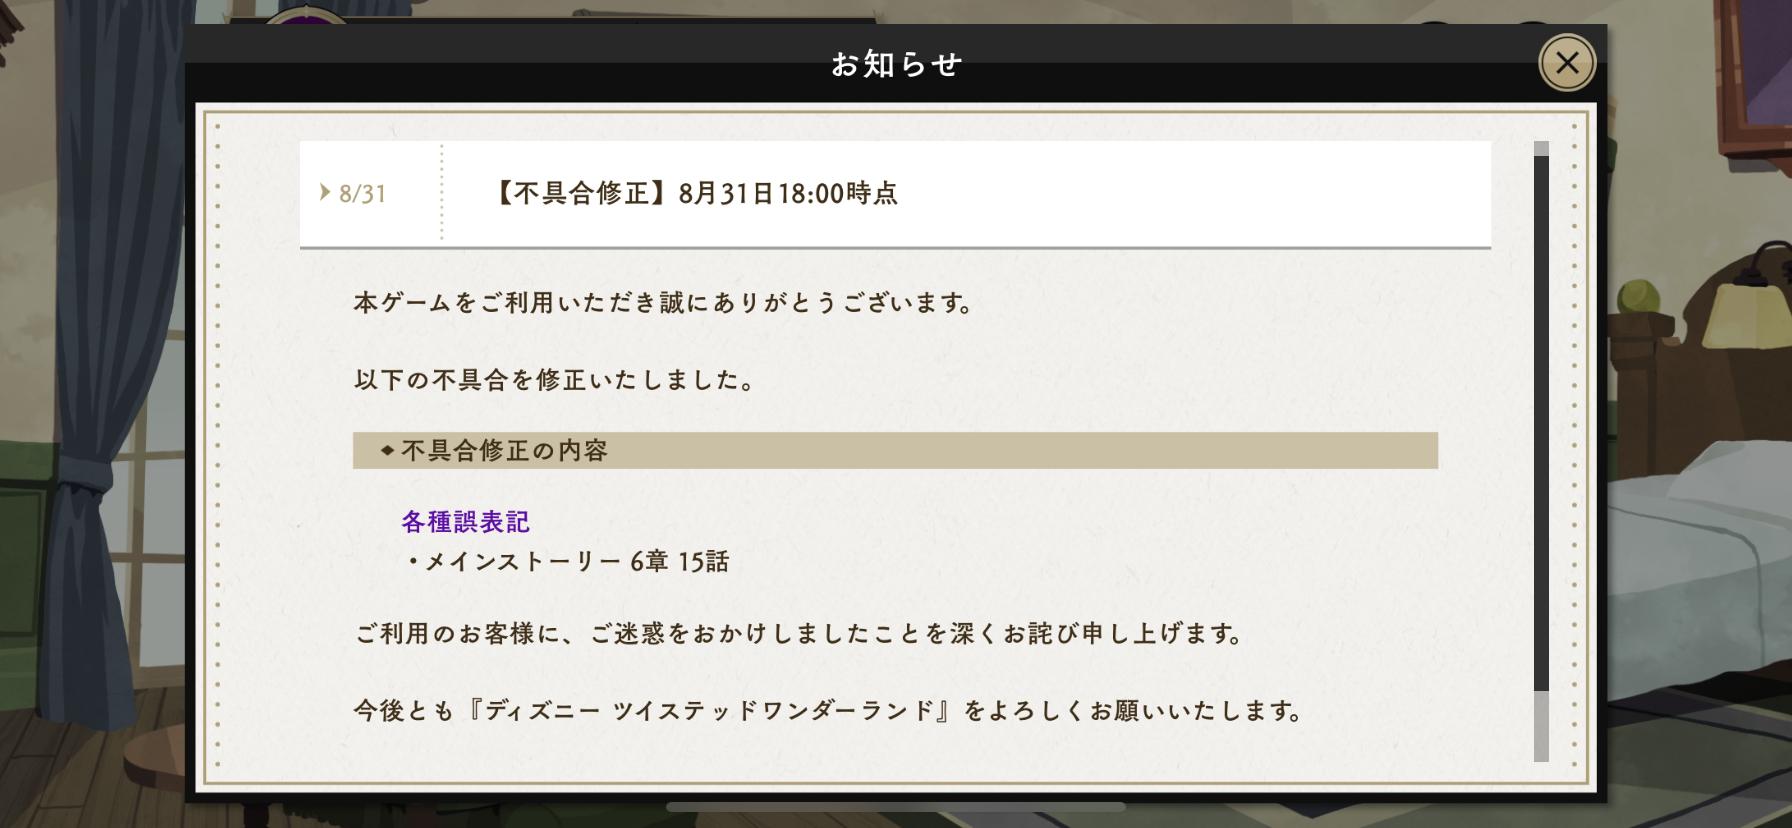 f:id:motimoti444:20210831180519p:plain